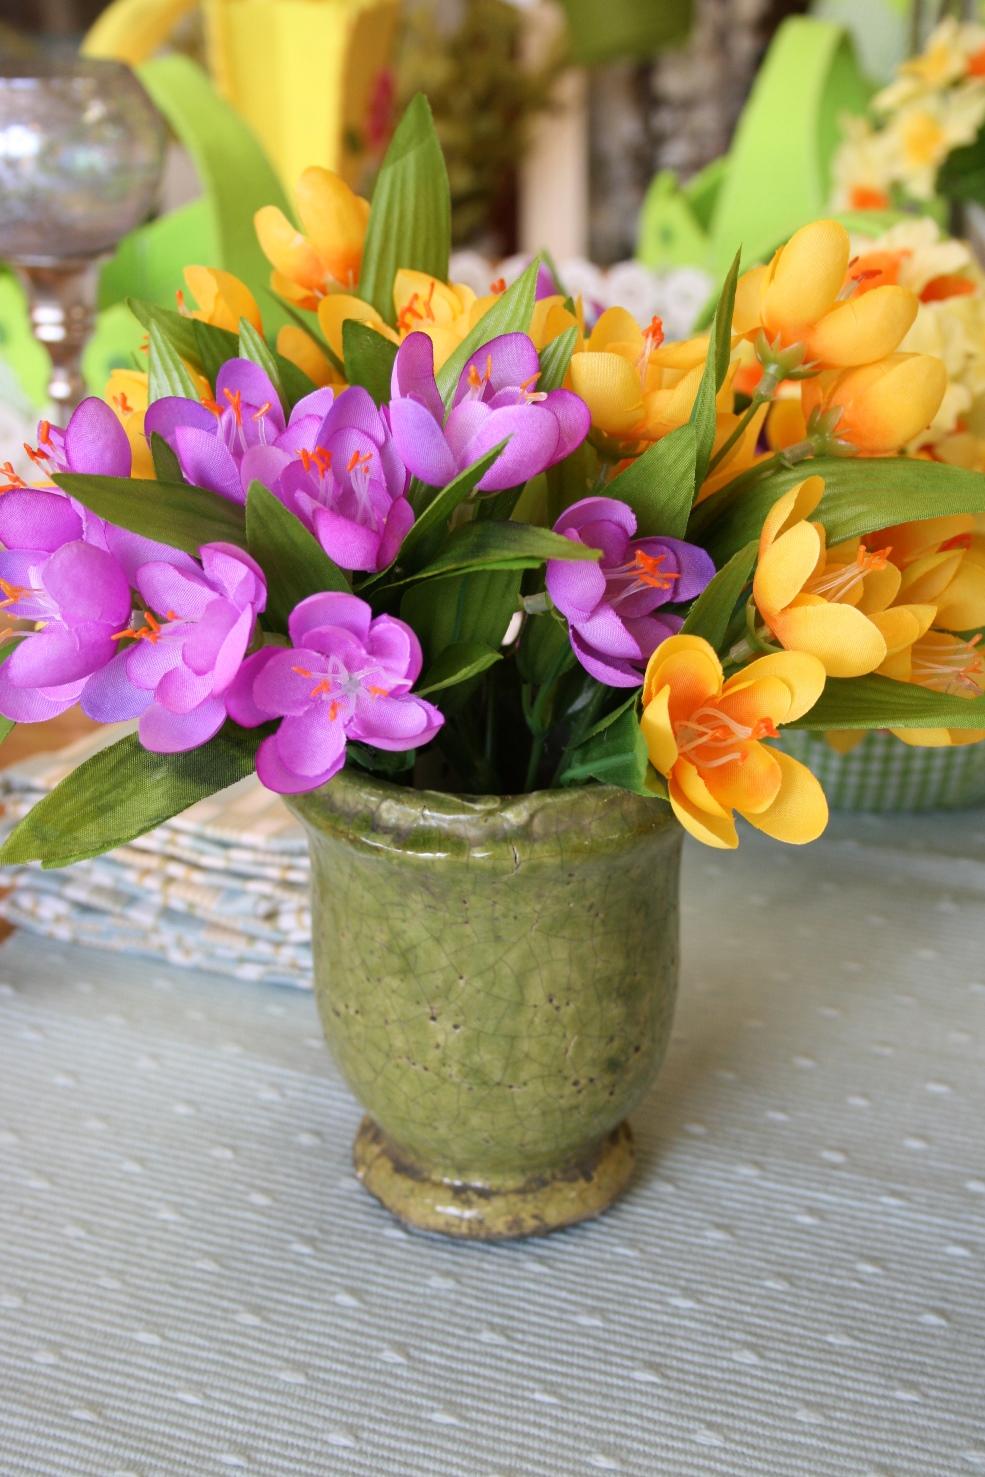 Vase - €6.00  Flowers - € 2.50 per bunch